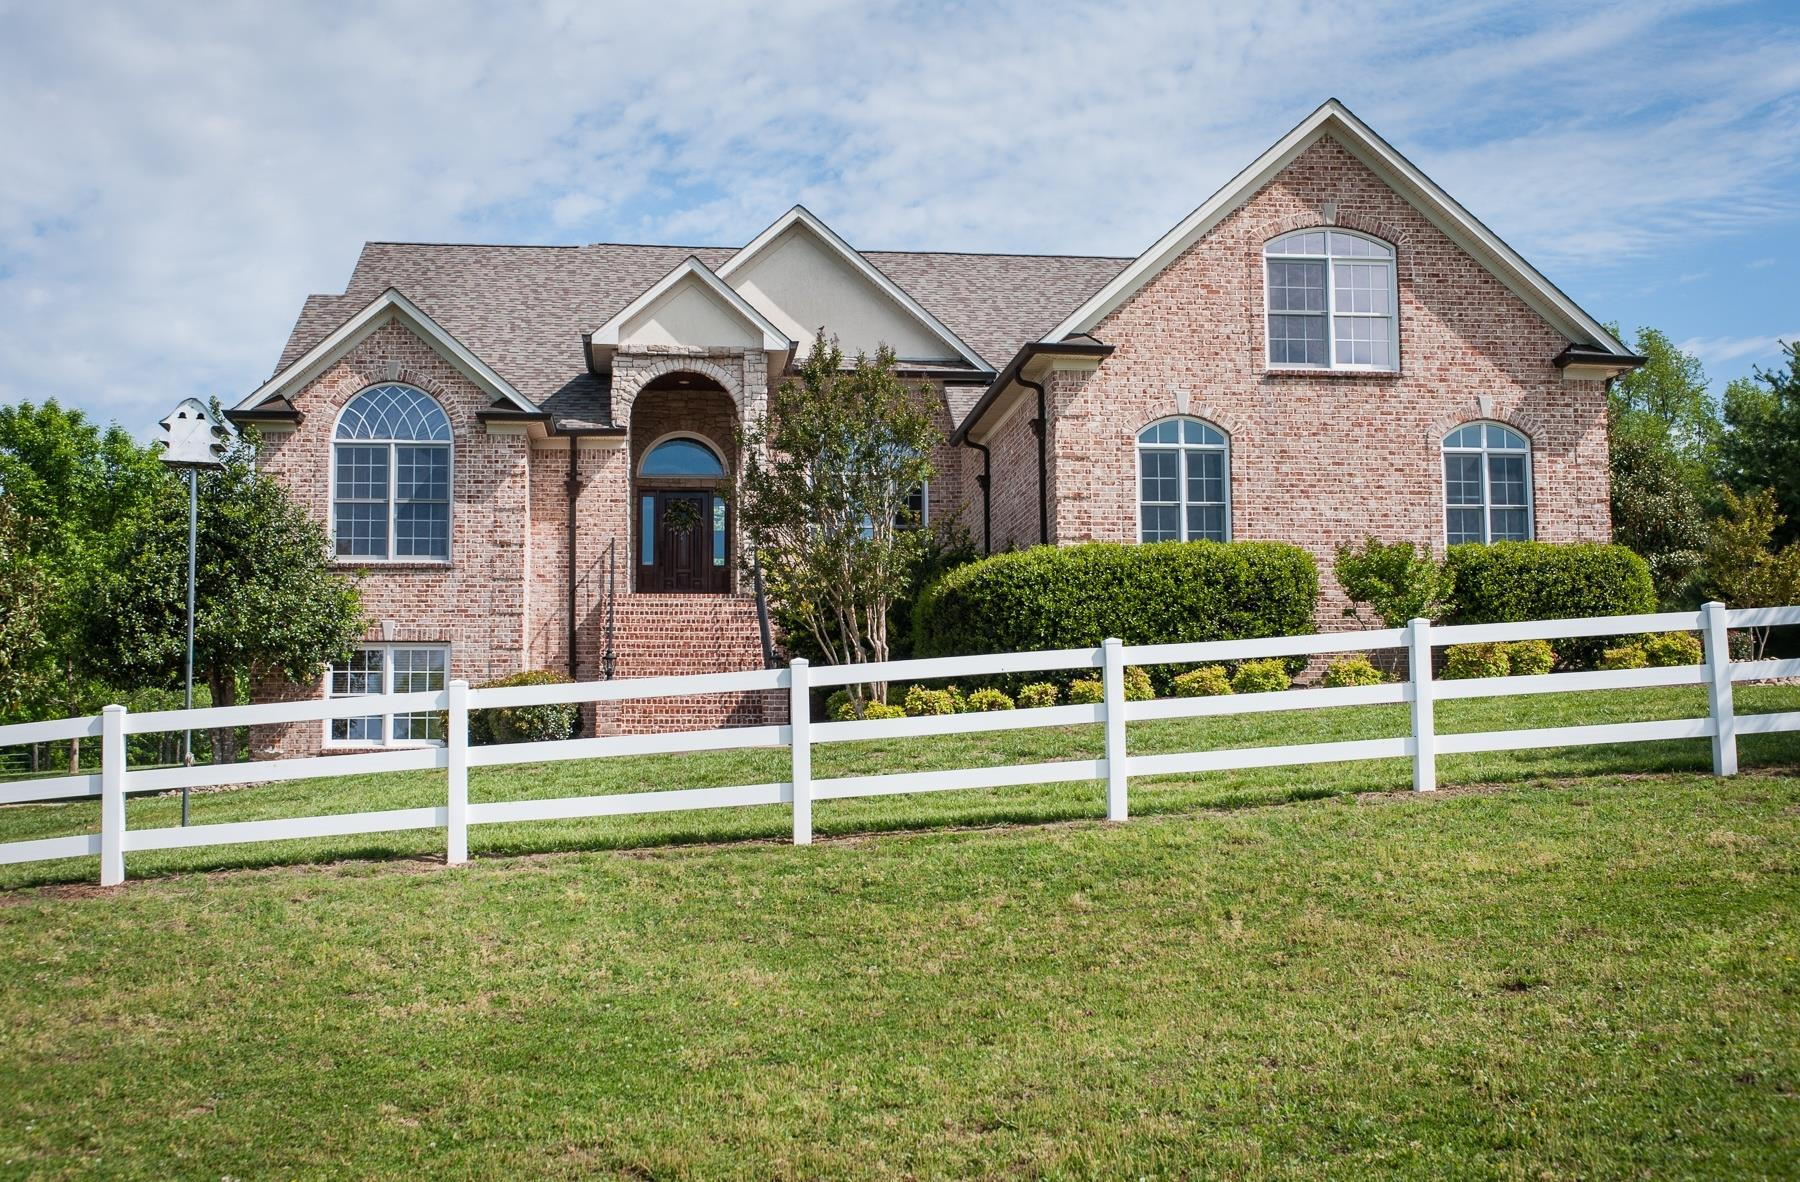 10011 Central Pike, Mount Juliet, TN 37122 - Mount Juliet, TN real estate listing